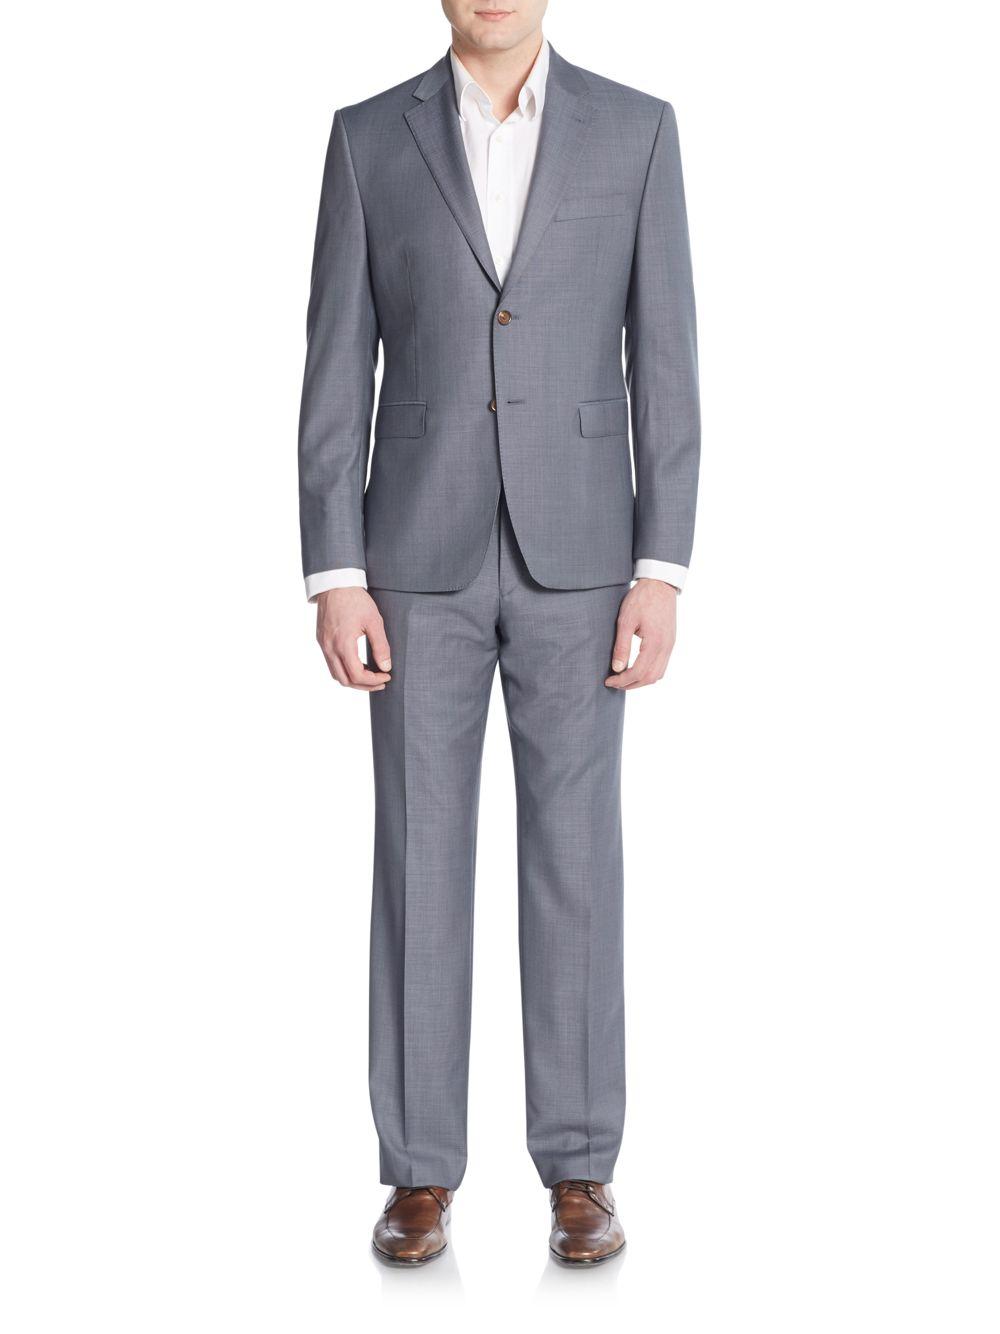 lauren by ralph lauren slim fit sharkskin wool suit in. Black Bedroom Furniture Sets. Home Design Ideas